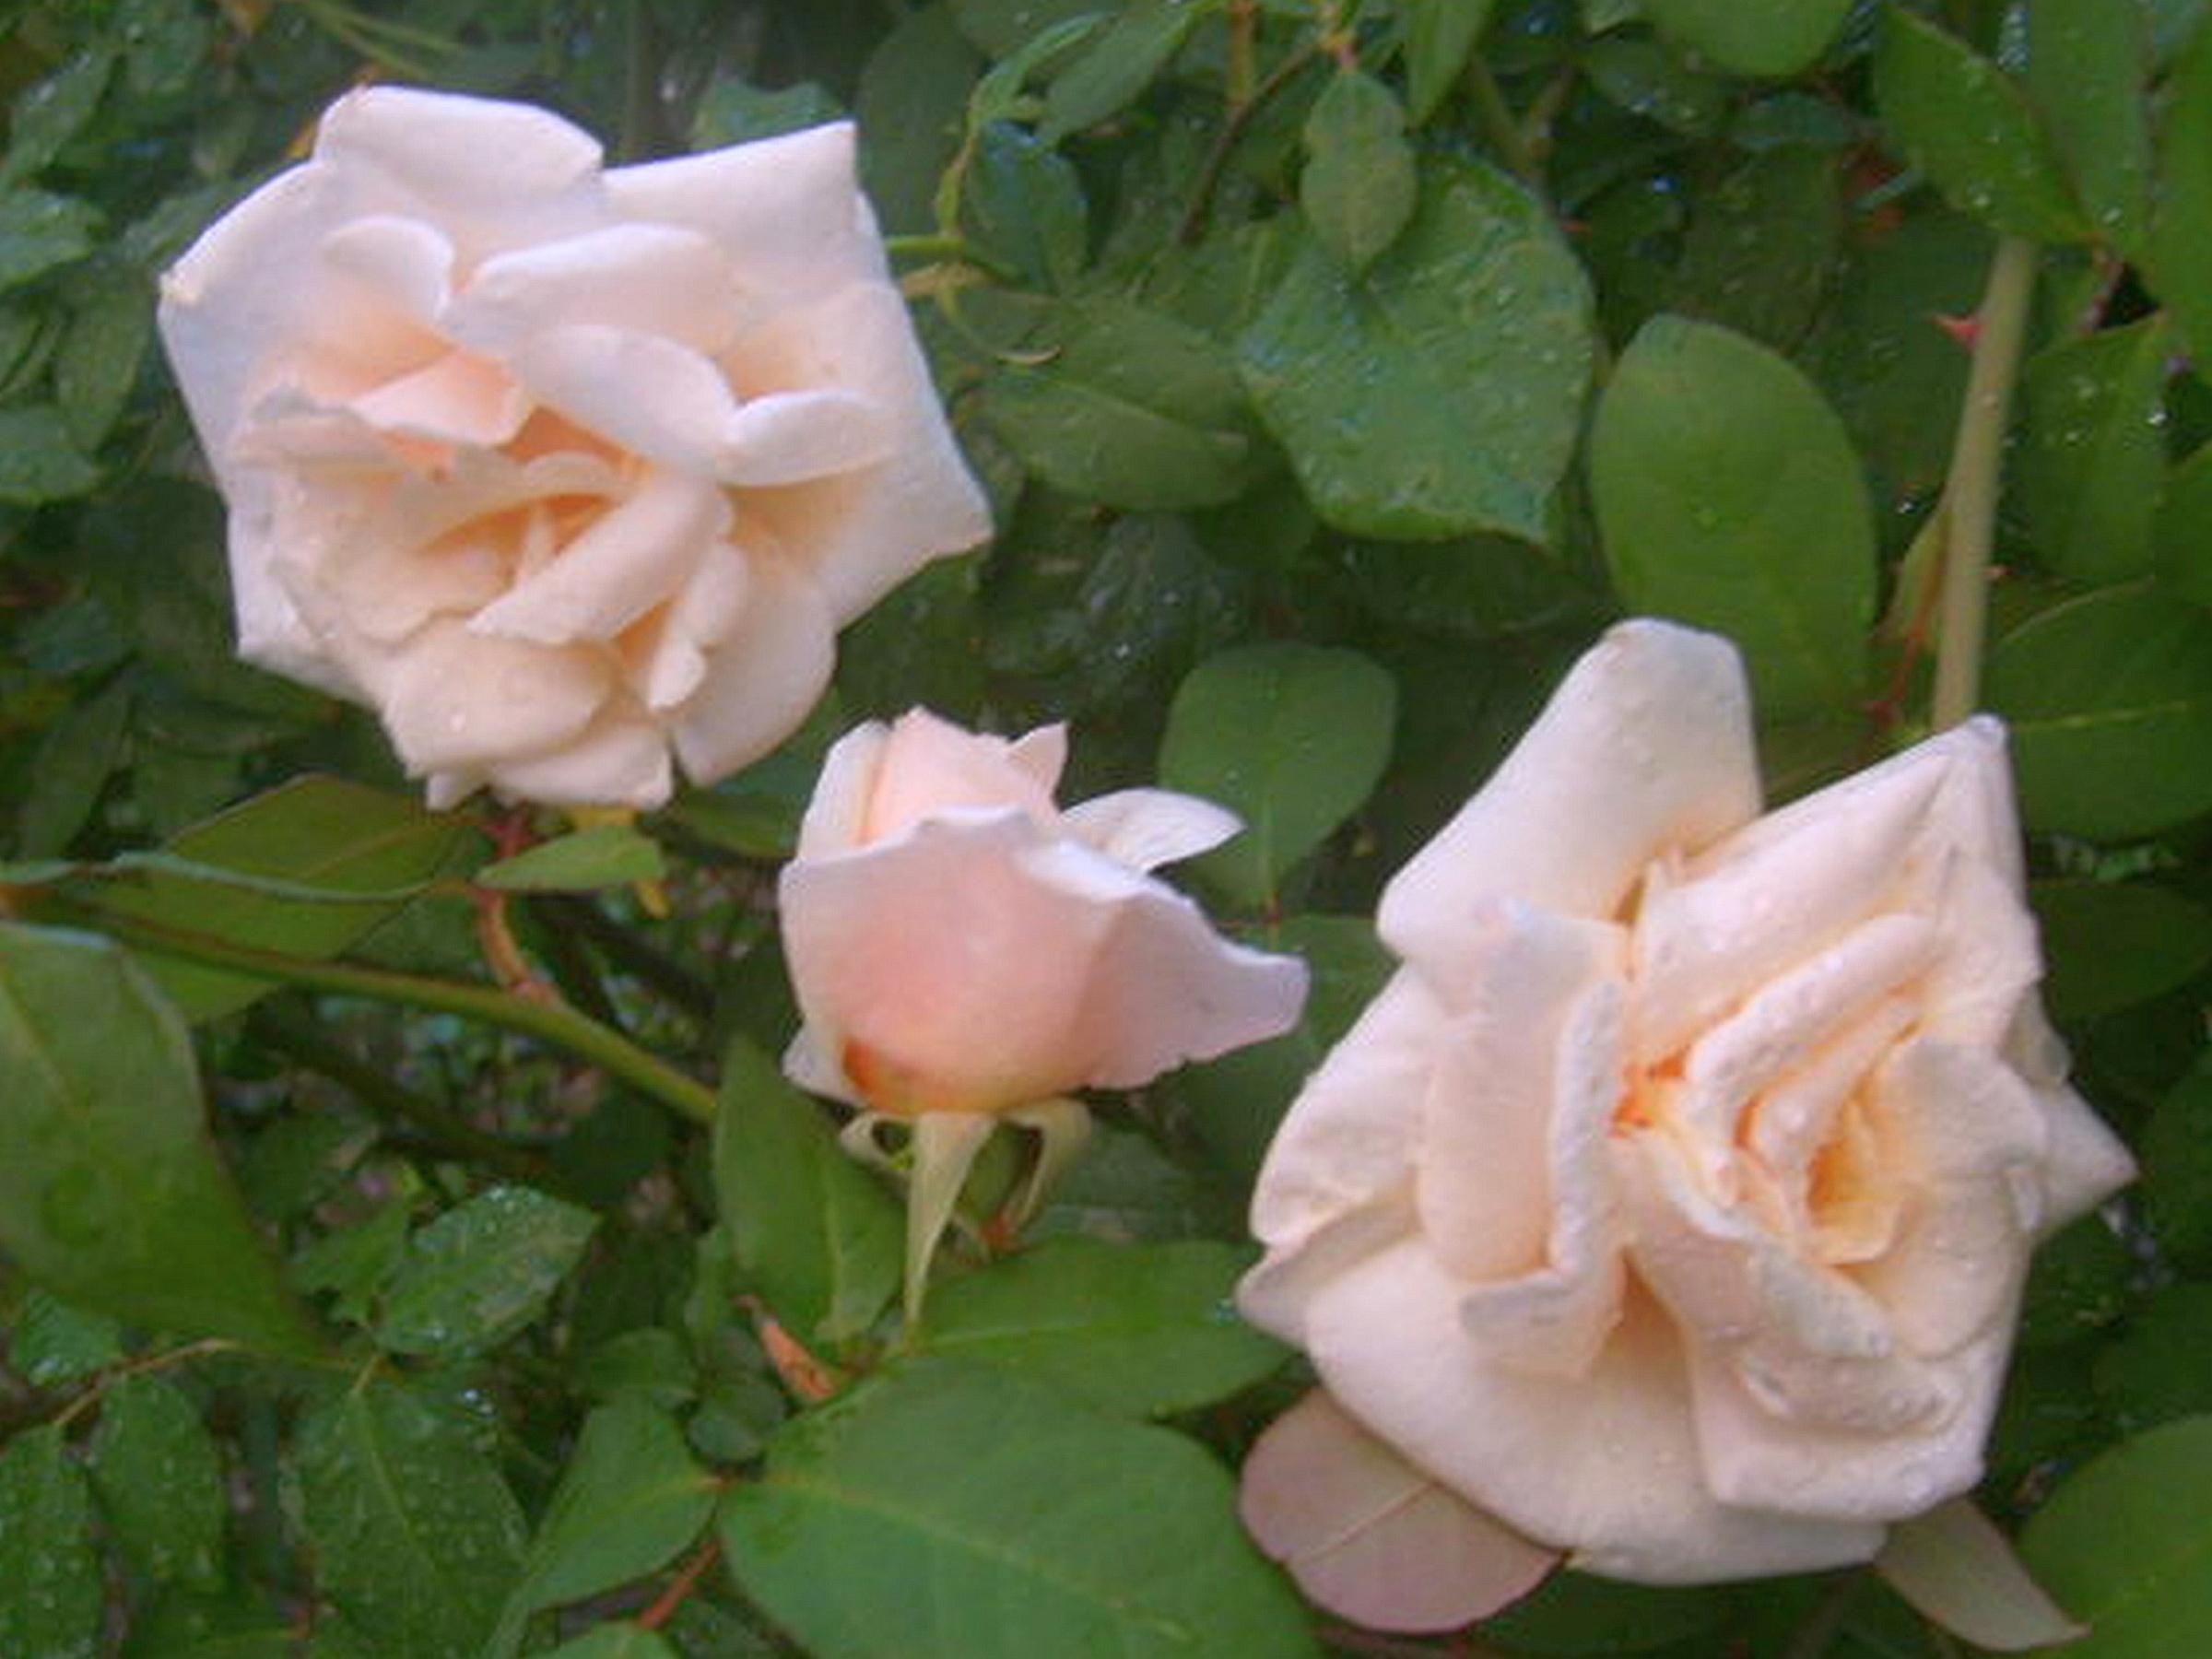 Pinwheel crepe crape false jasmine live plant shrub tabernaemontana safrano apricot pink shrub rose bush live plant heirloom own root antique old found garden fragrant mightylinksfo